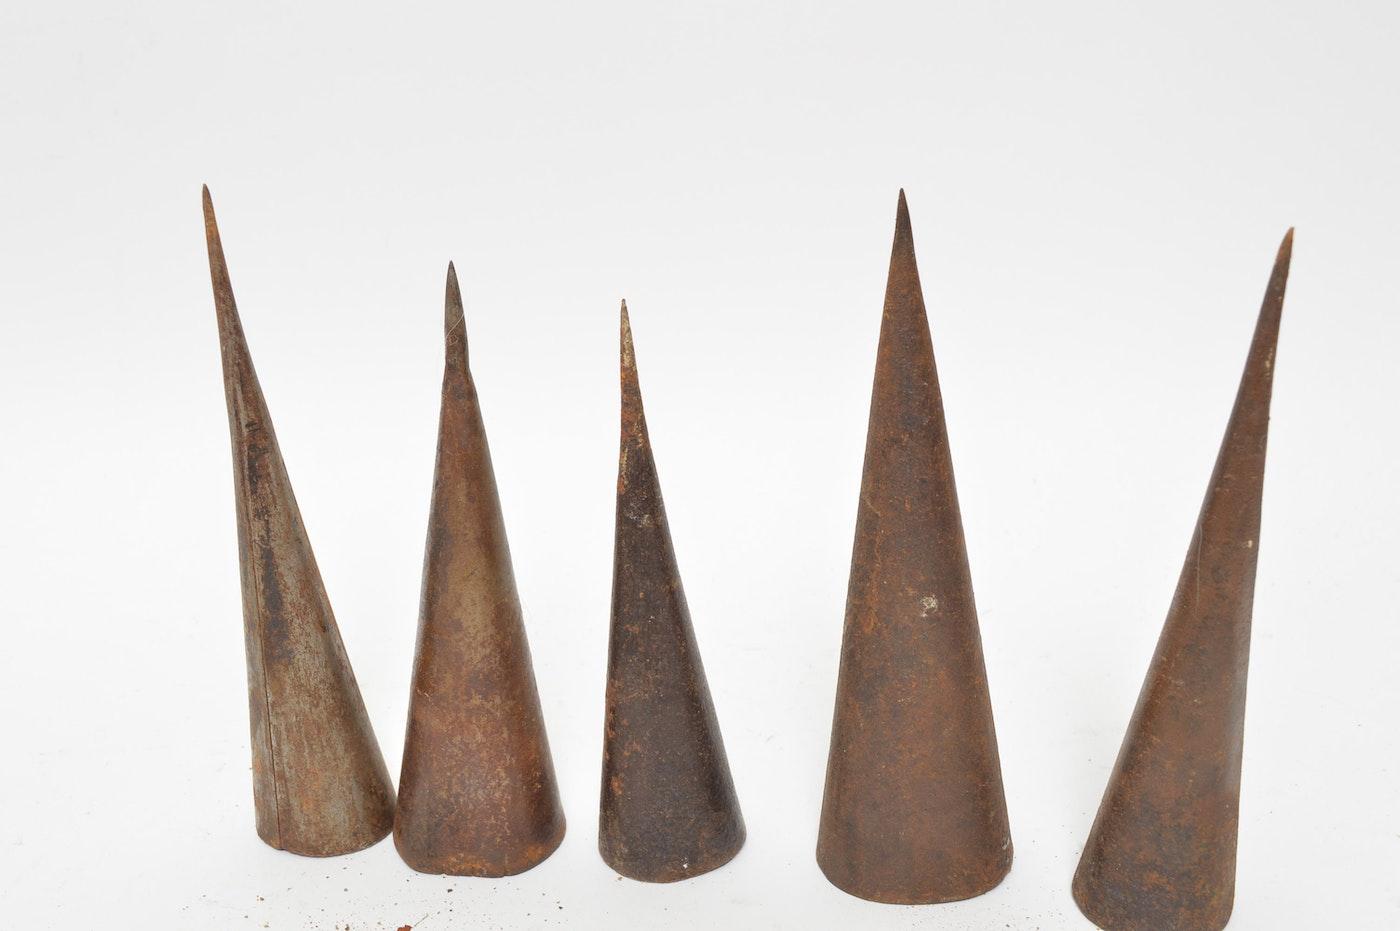 Vintage Tobacco Harvesting Tools Ebth